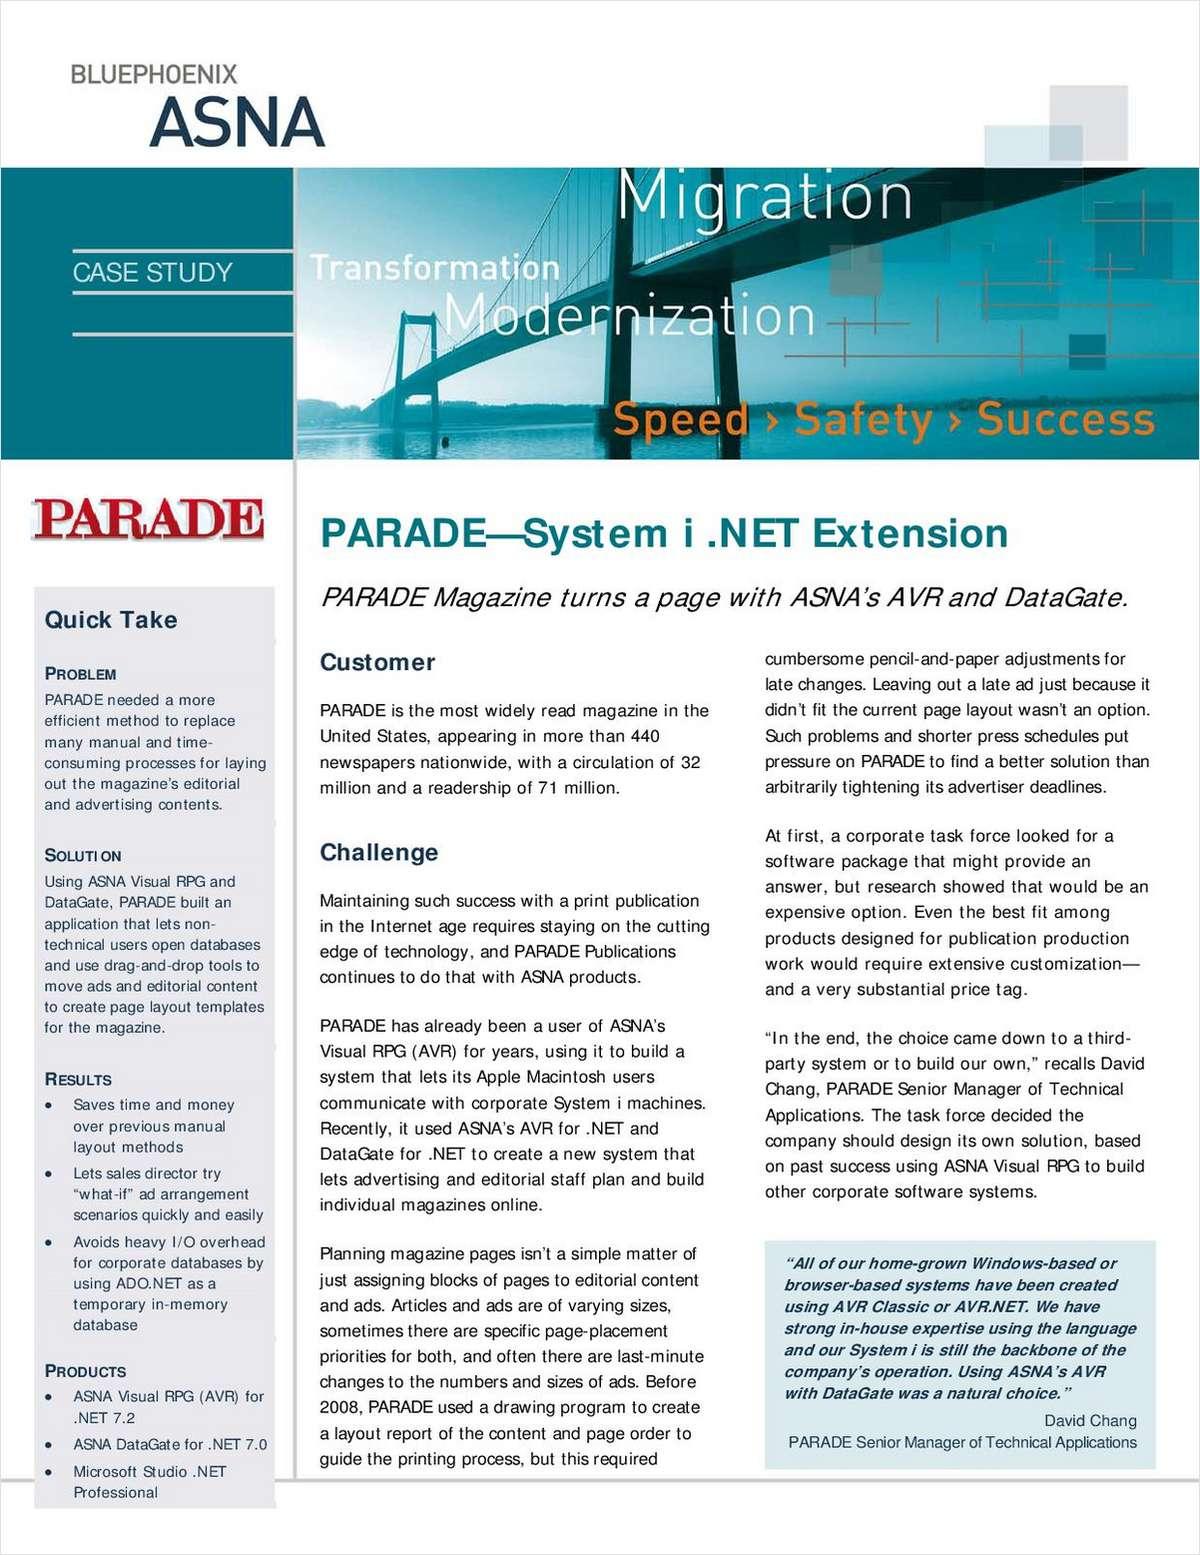 Case Study: Parade Magazine - System i .NET Extension